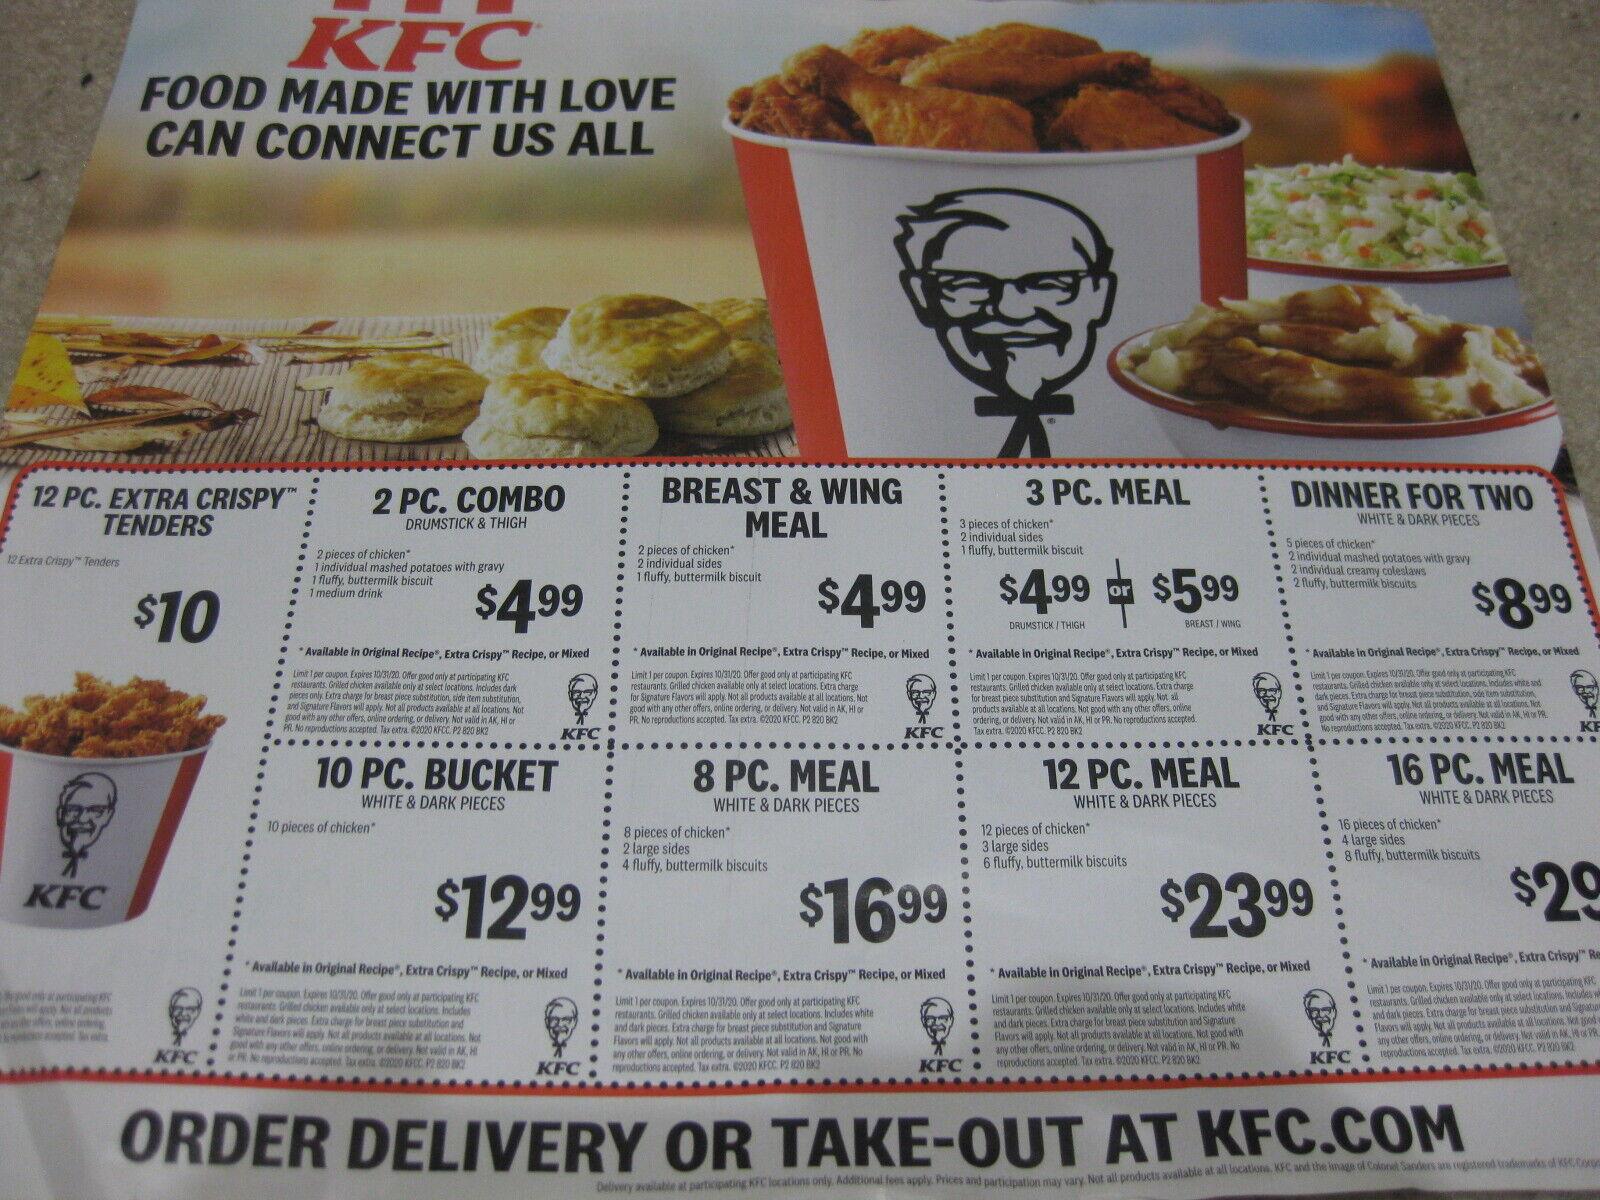 KFC Kentucky Fried Chicken Fast Food Coupons Savings Lot Save Money Off Bucket - $2.50